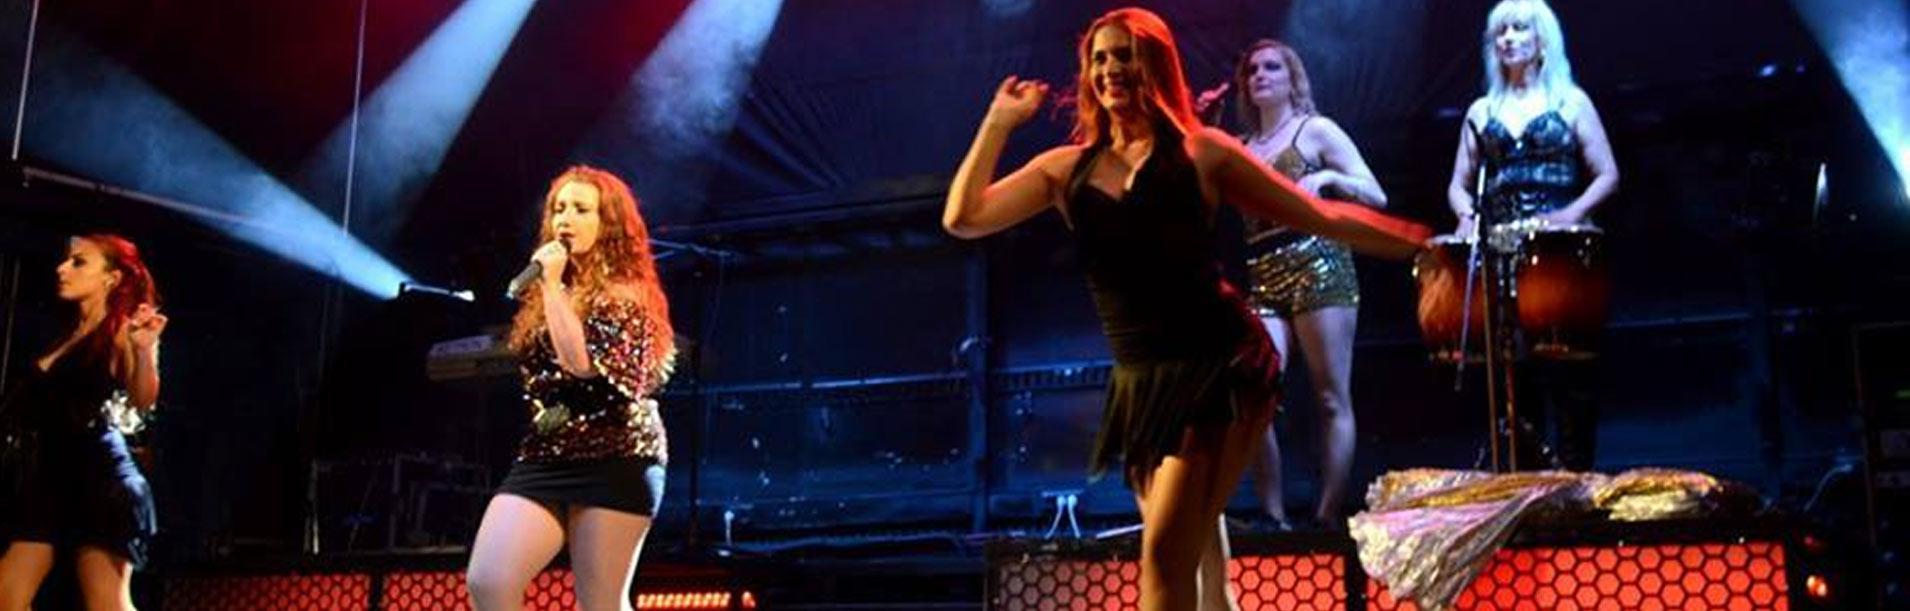 Anabela e as Top Girls, Musica Portuguesa, Show, musica ao vivo, Espetáculo, Espetáculos, Baile, artistas, musica popular, popular Portuguesa, festas, artista, cantoras, musicas